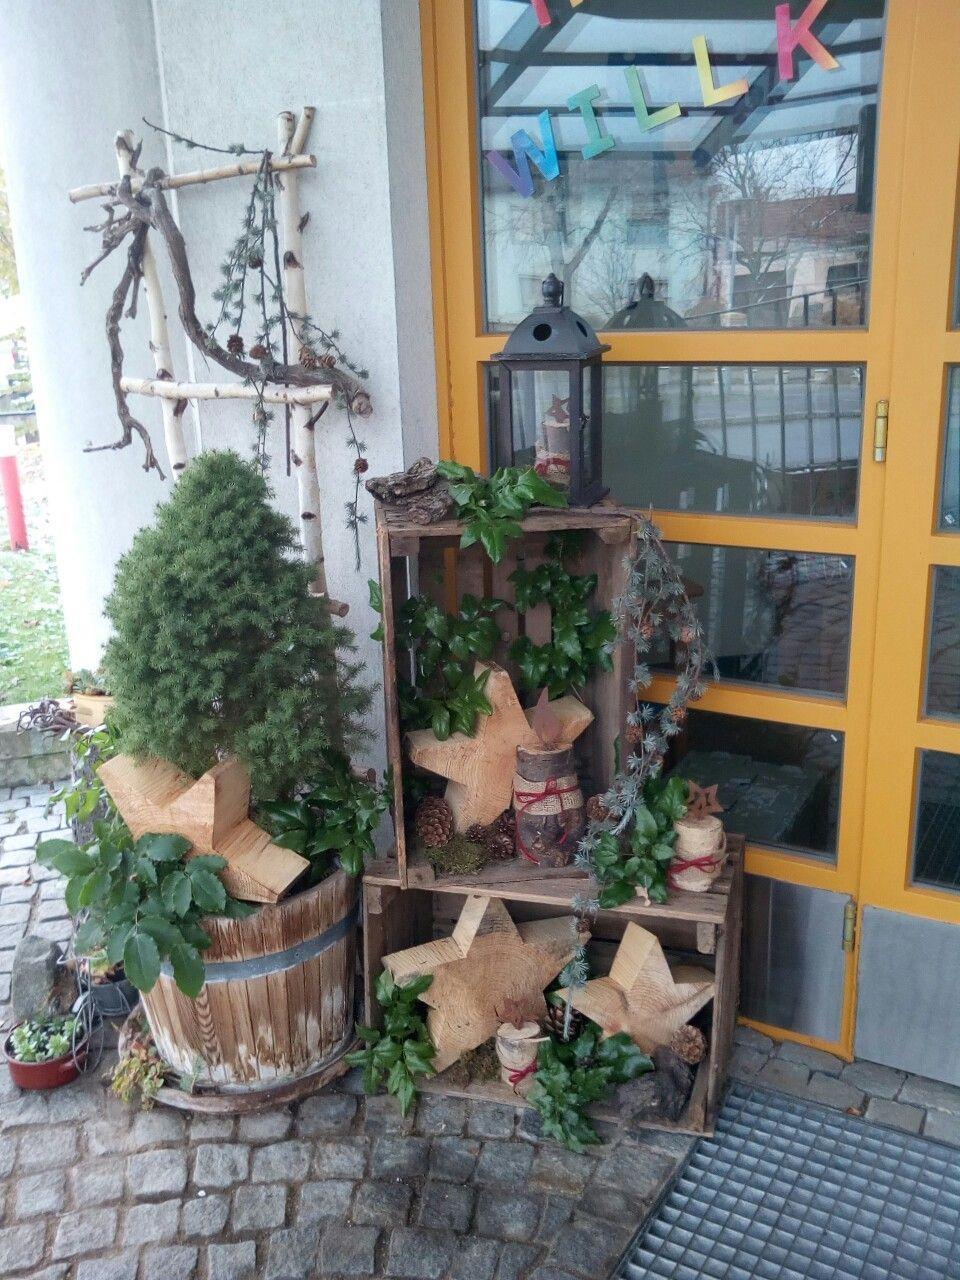 Rustikale Weihnachten - Wintergartenideen - #rustikale ... dedans Decoration Exterieur